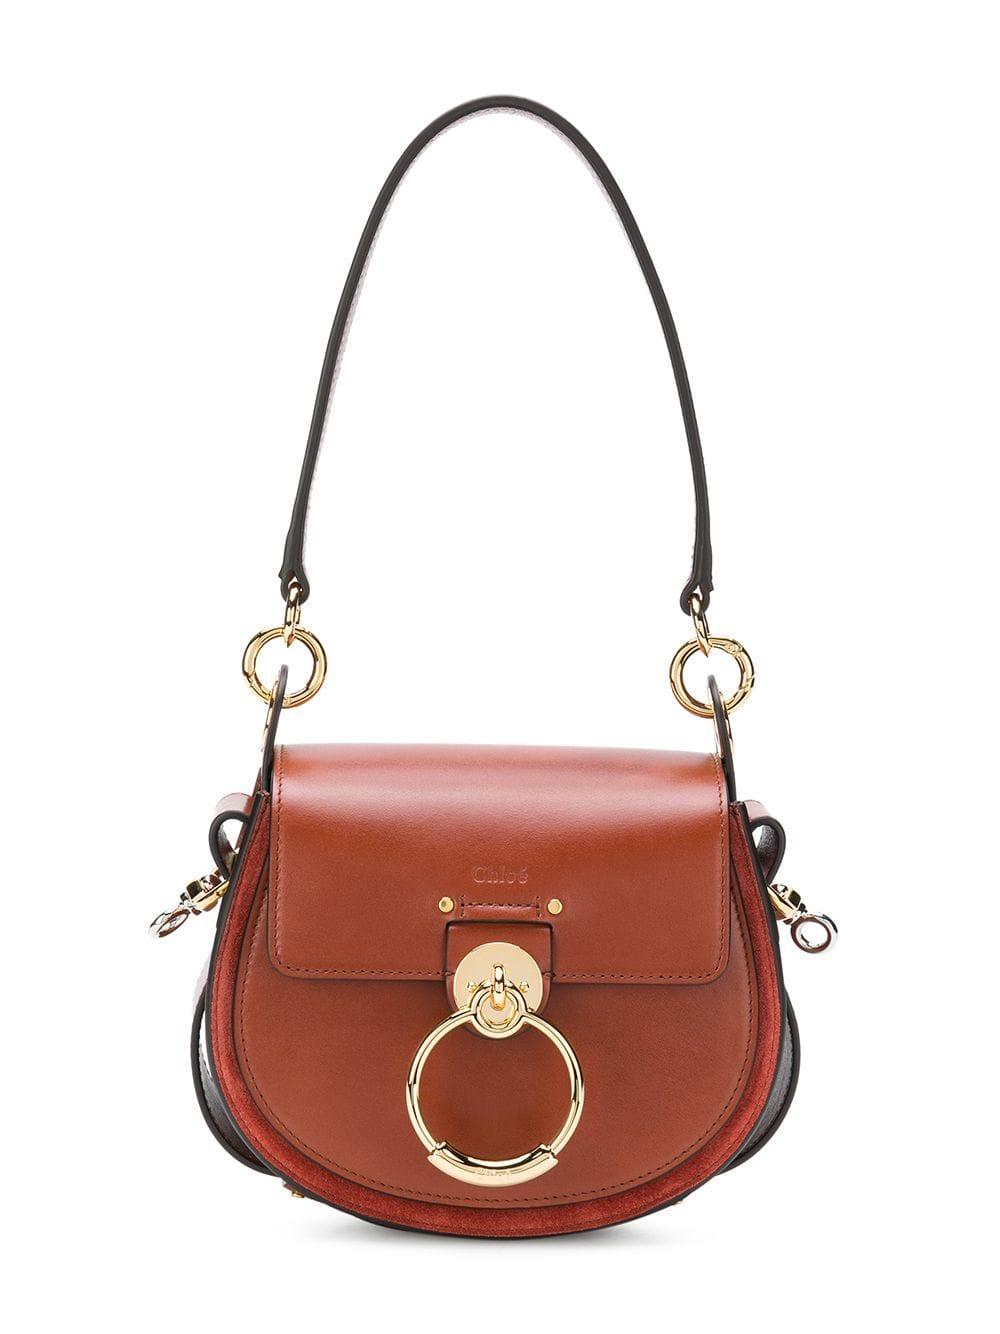 Chloé Tess shoulder bag - shop